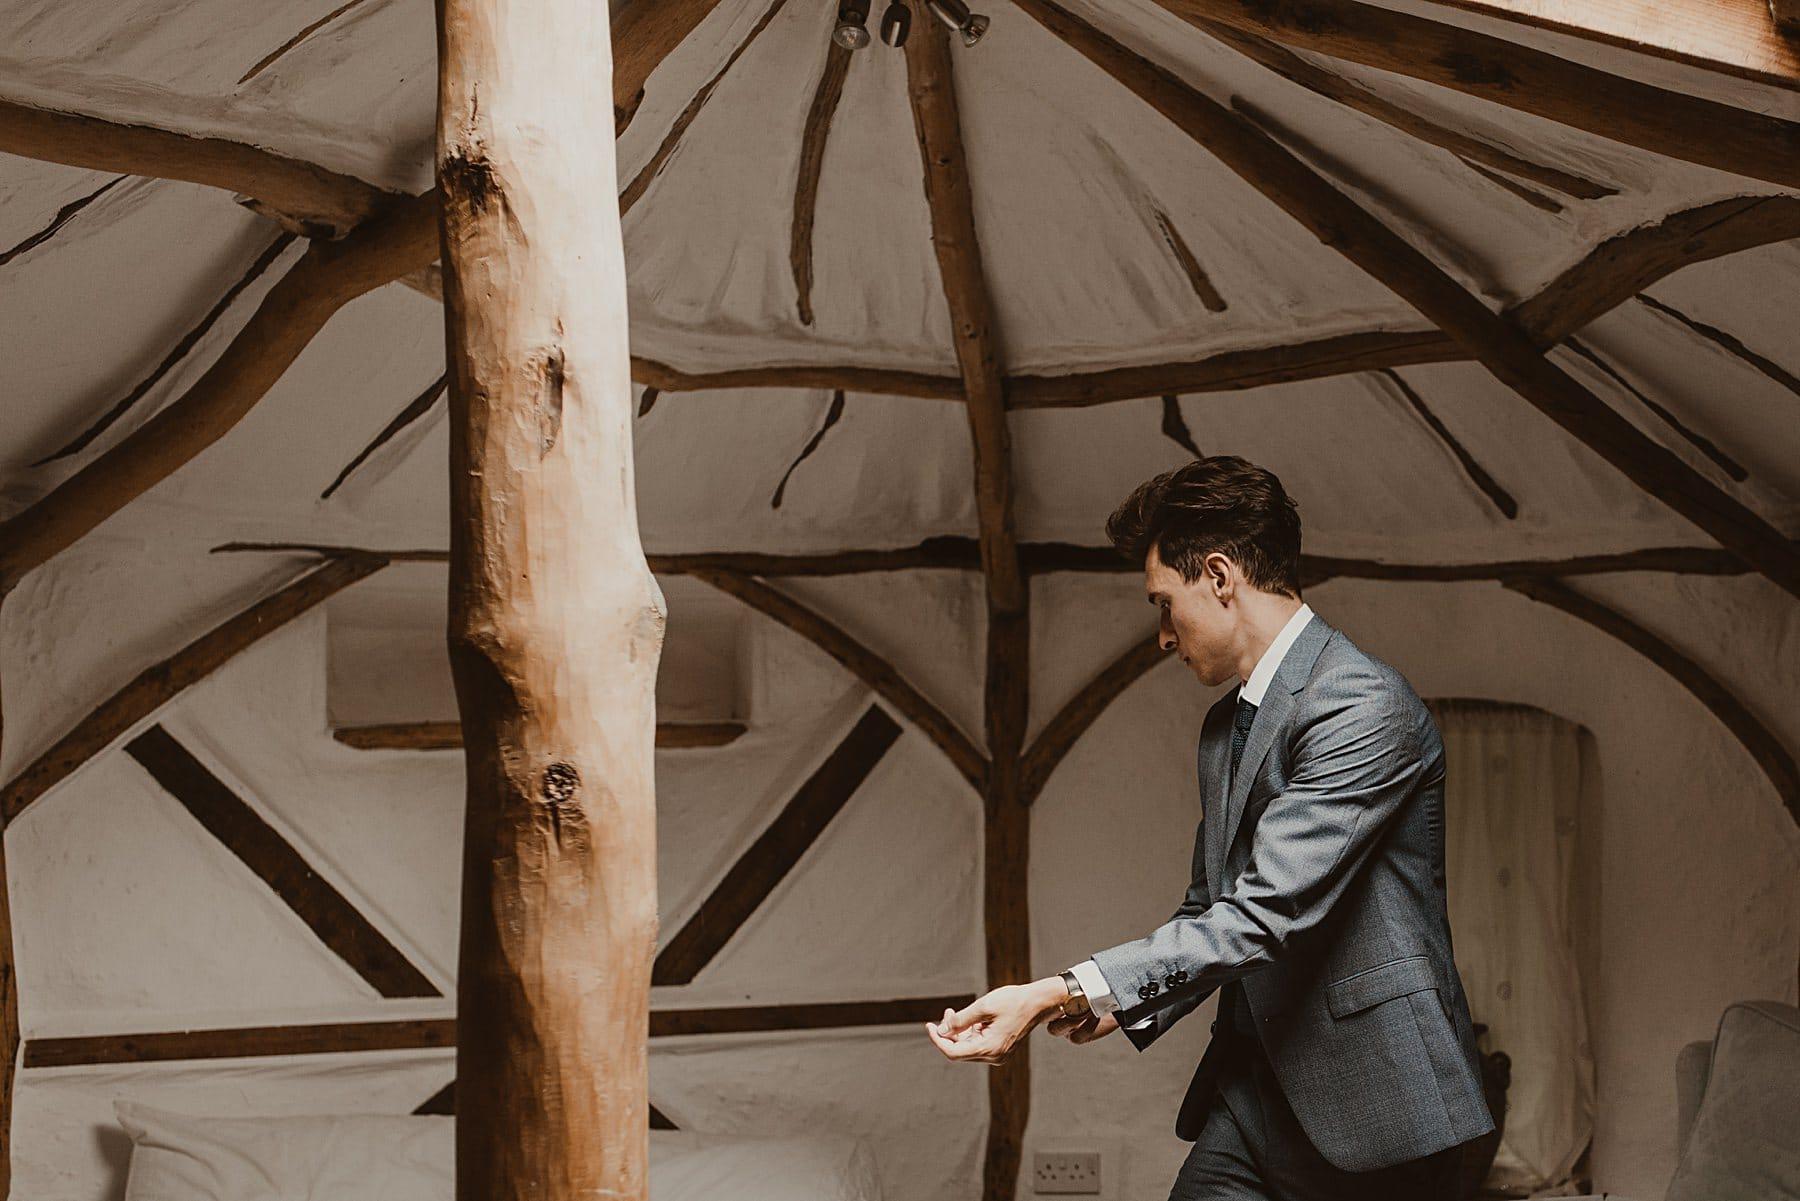 Groom getting ready in yurt